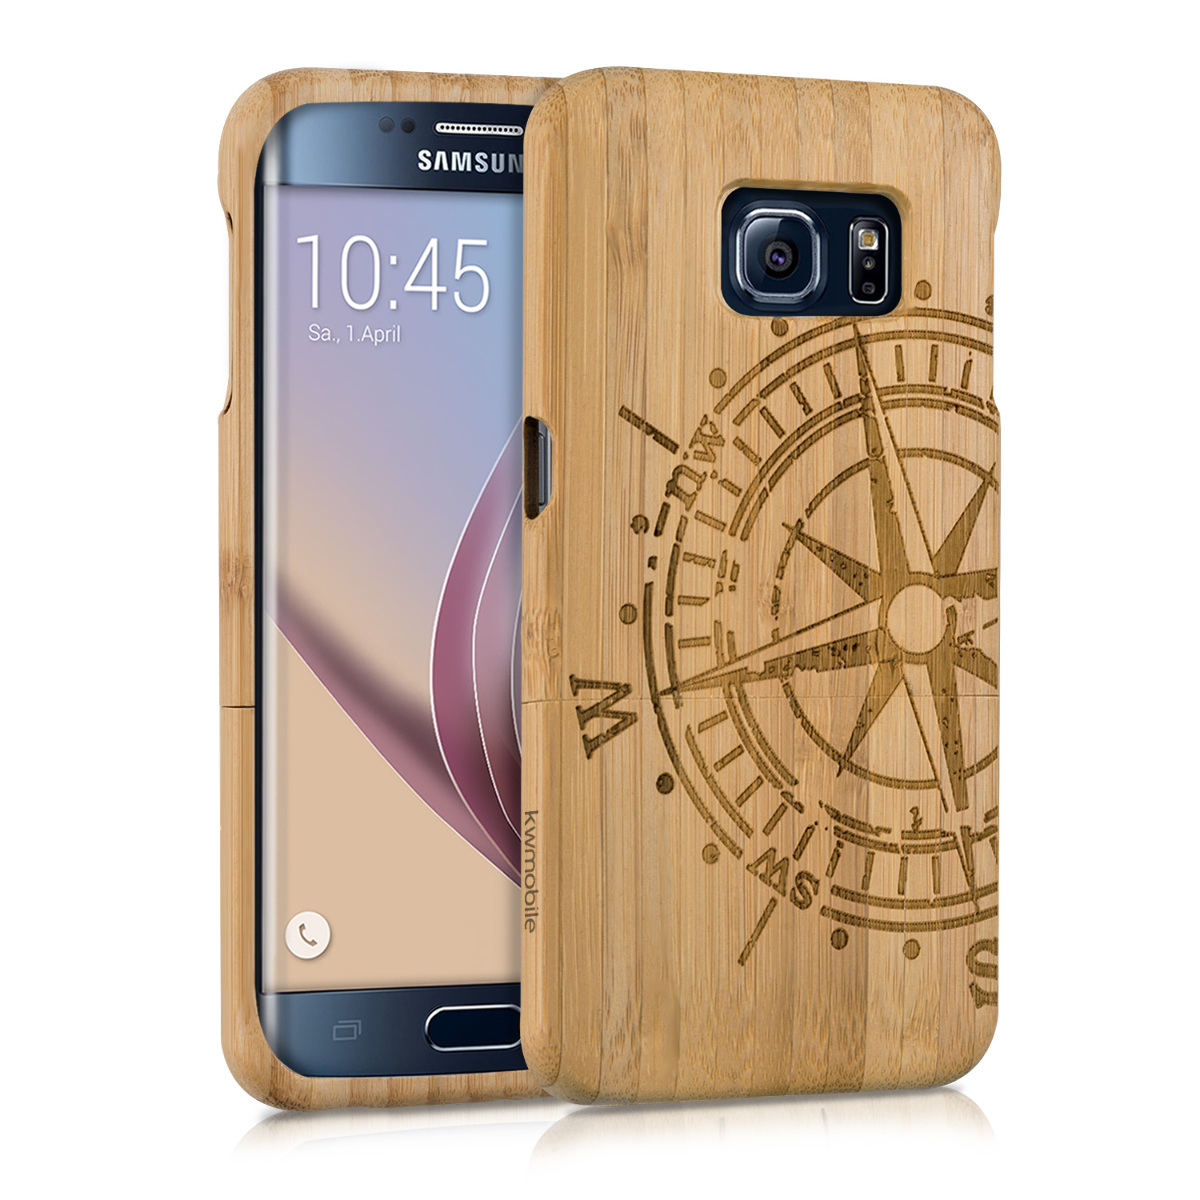 KW Σκληρή Bamboo Ξύλινη Θήκη Samsung Galaxy S6 Edge (34905.01)